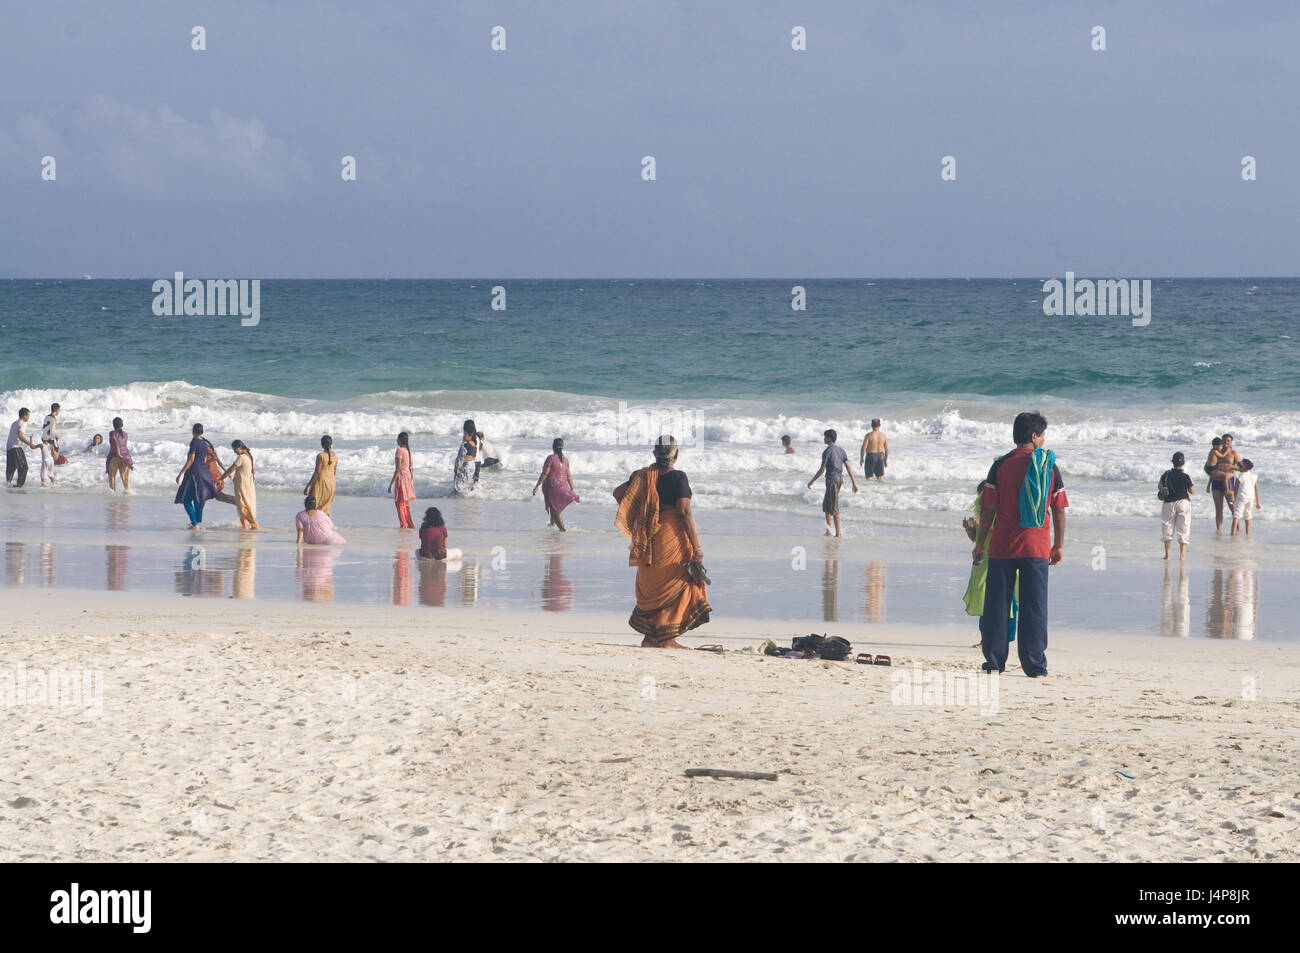 Sandy beach, Radha Nagar, Indian ocean, person, Havelock Insel, Andamanen, India, no model release, - Stock Image